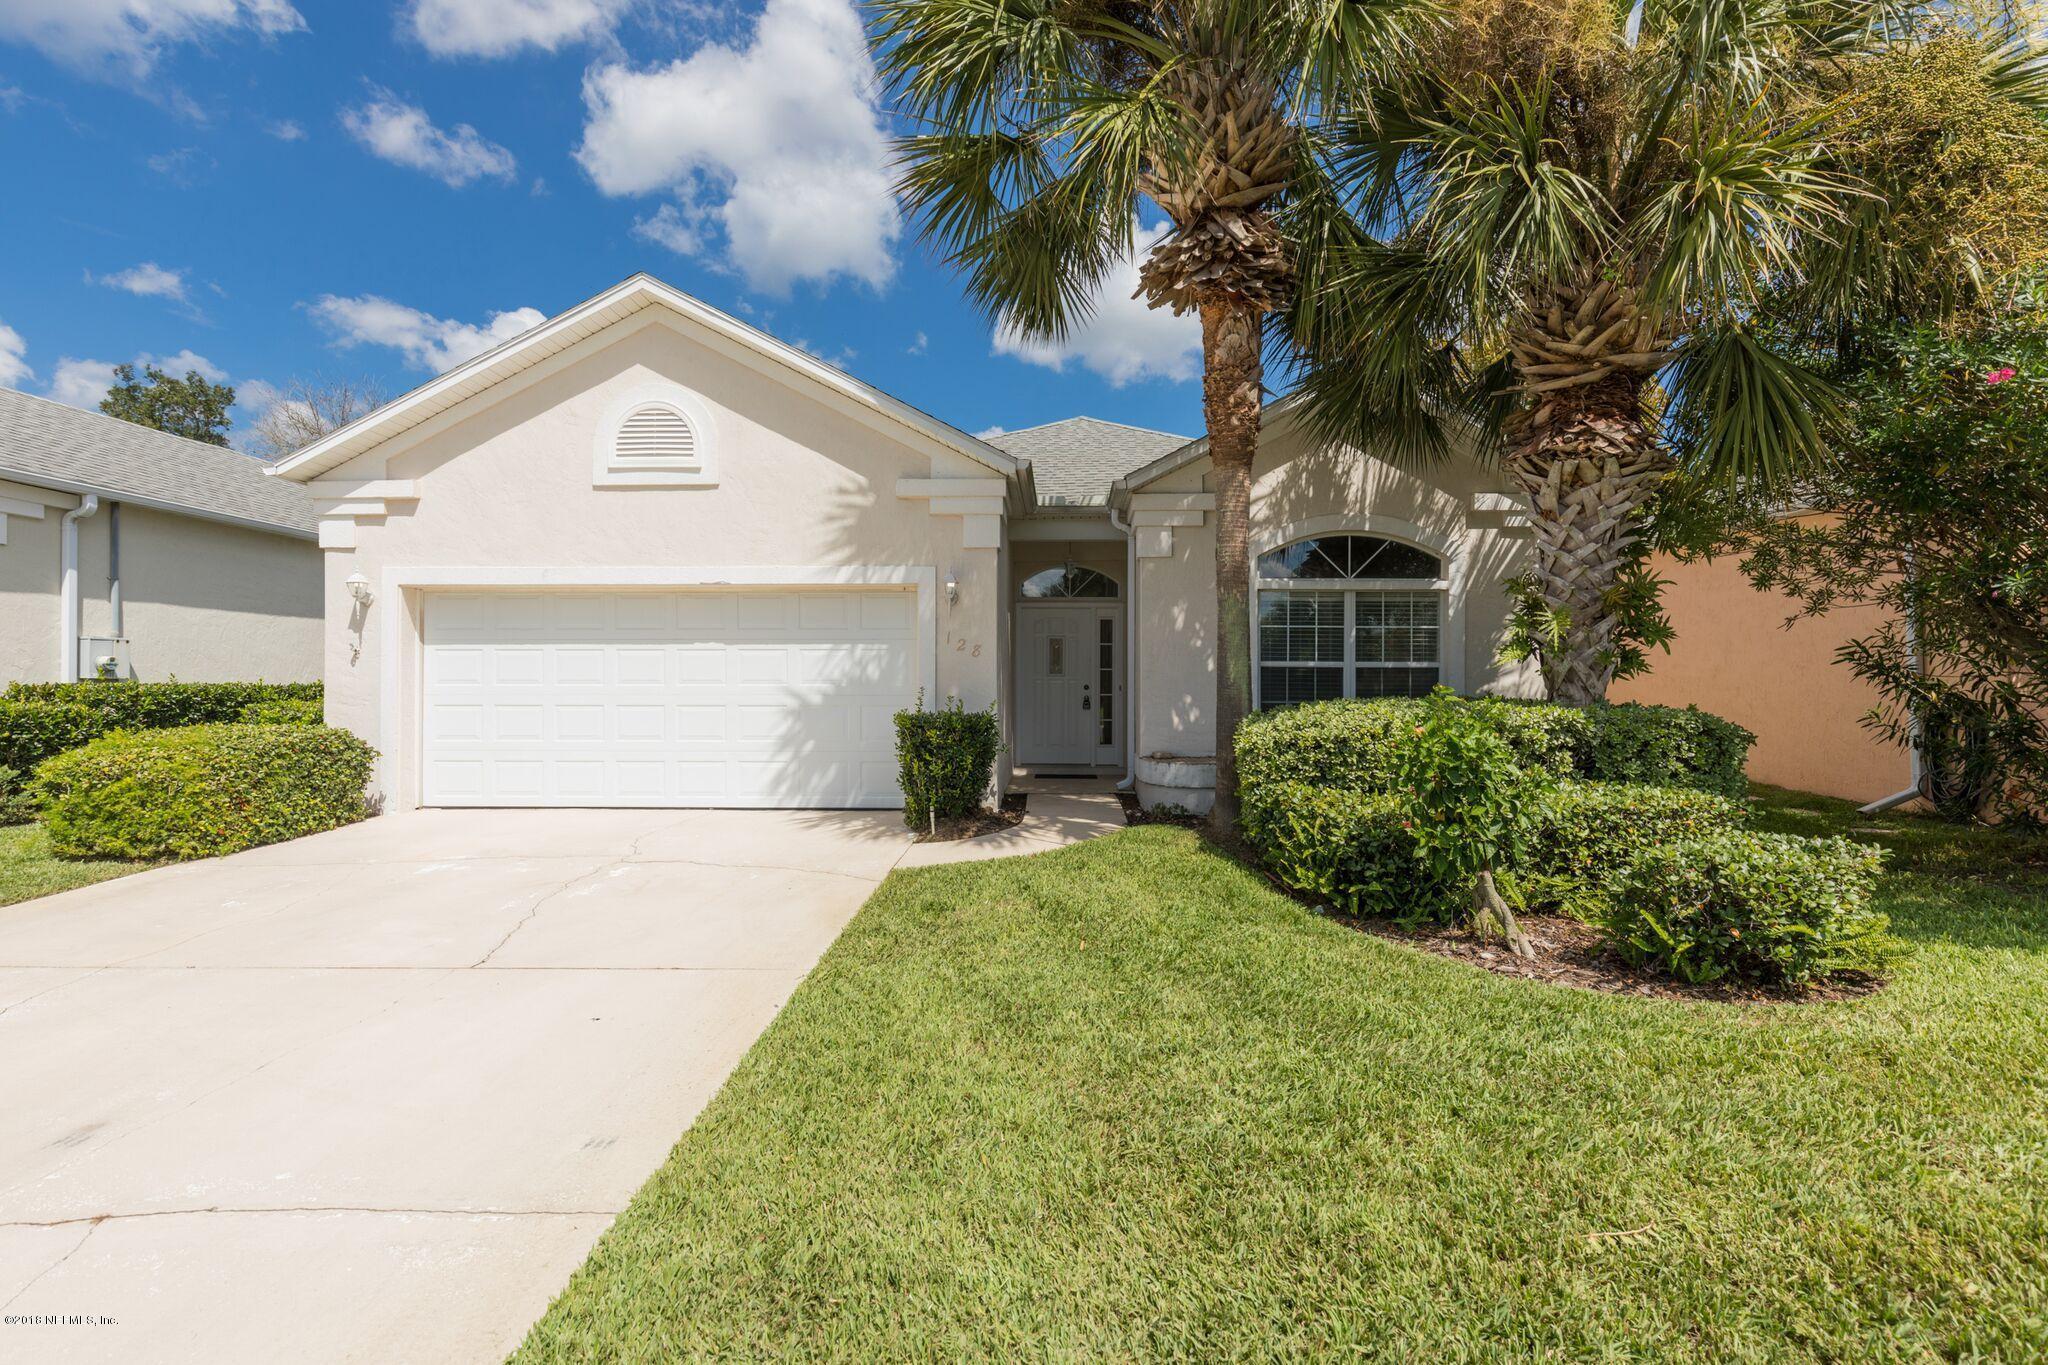 128 CEDAR RIDGE, ST AUGUSTINE, FLORIDA 32080, 2 Bedrooms Bedrooms, ,2 BathroomsBathrooms,Residential - single family,For sale,CEDAR RIDGE,957493